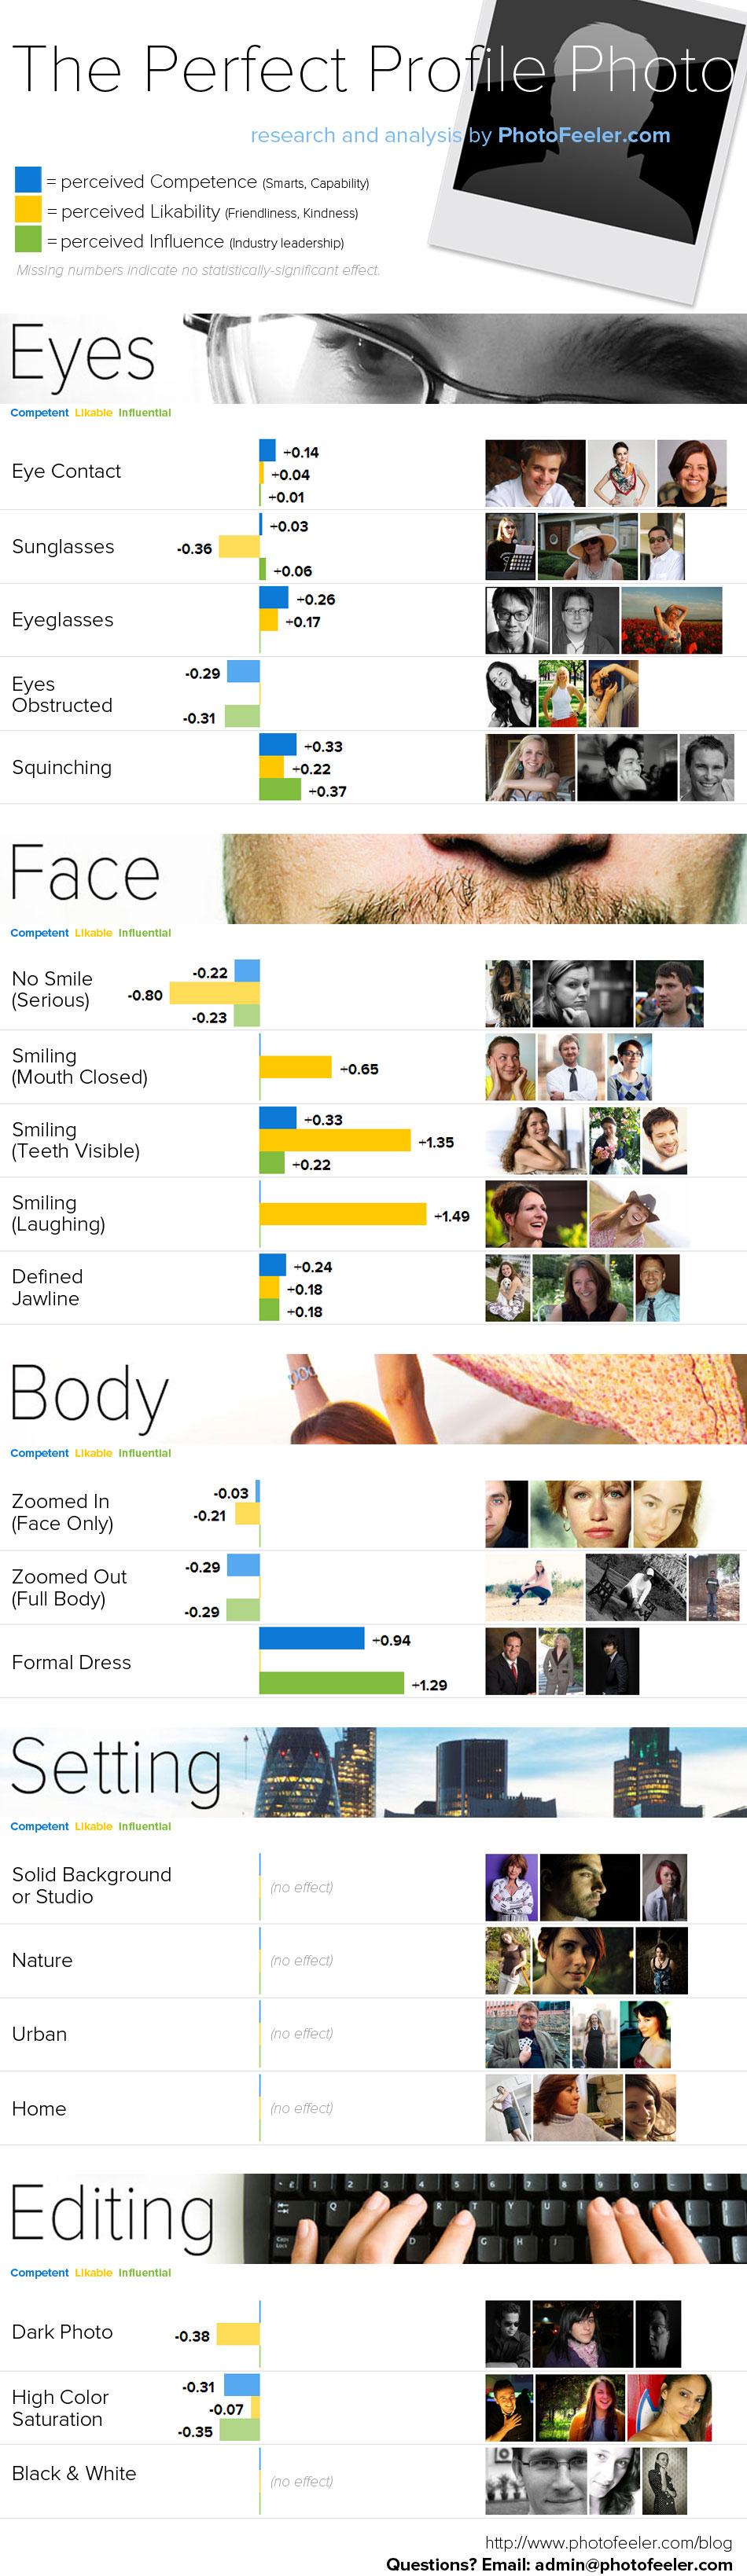 Perfect Profile Photo Infographic